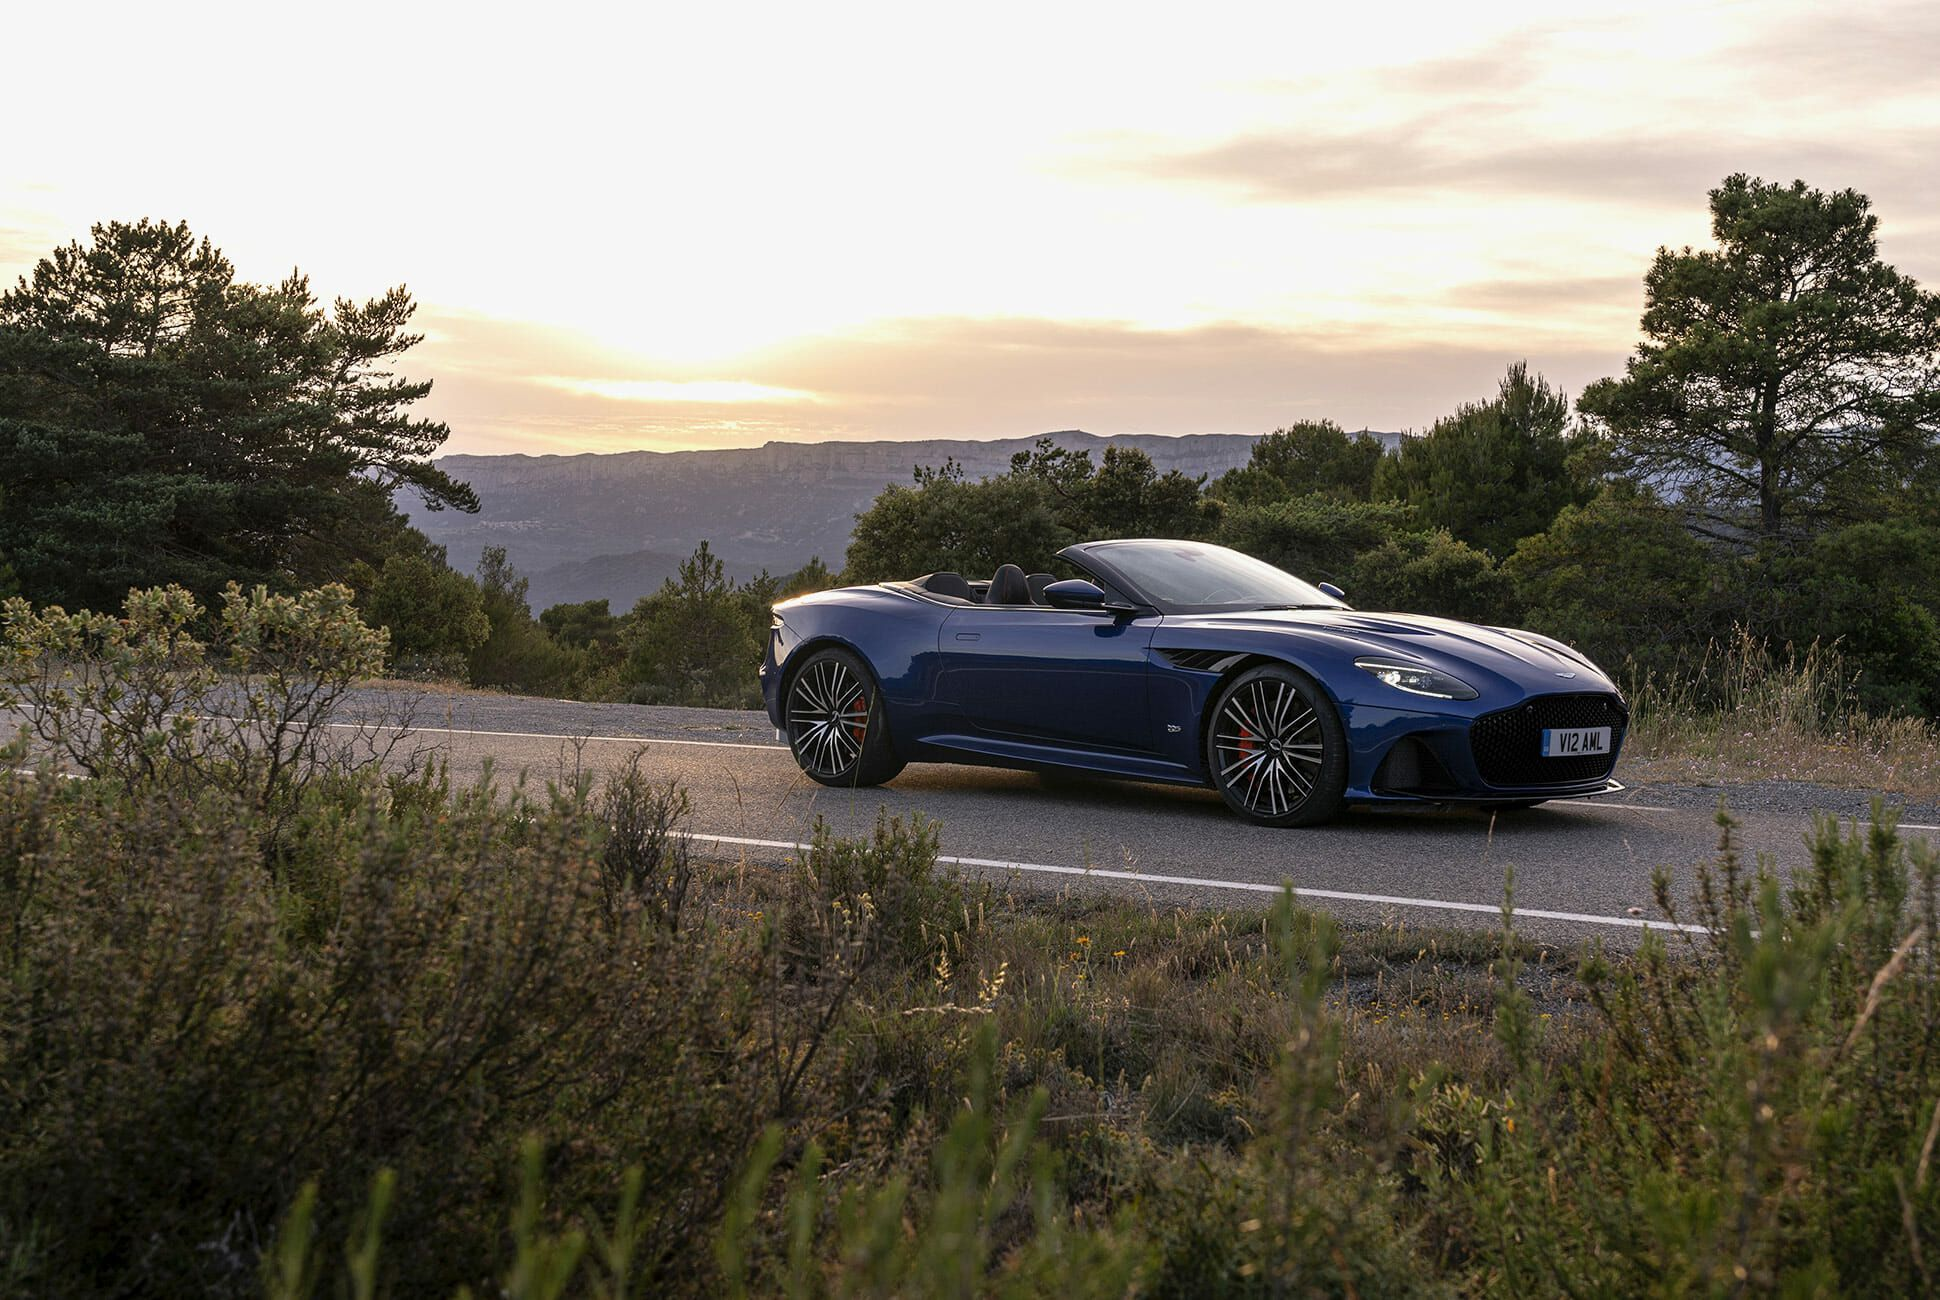 Aston-Martin-DBS-Superleggera-Volante-Review-gear-patrol-slide-3